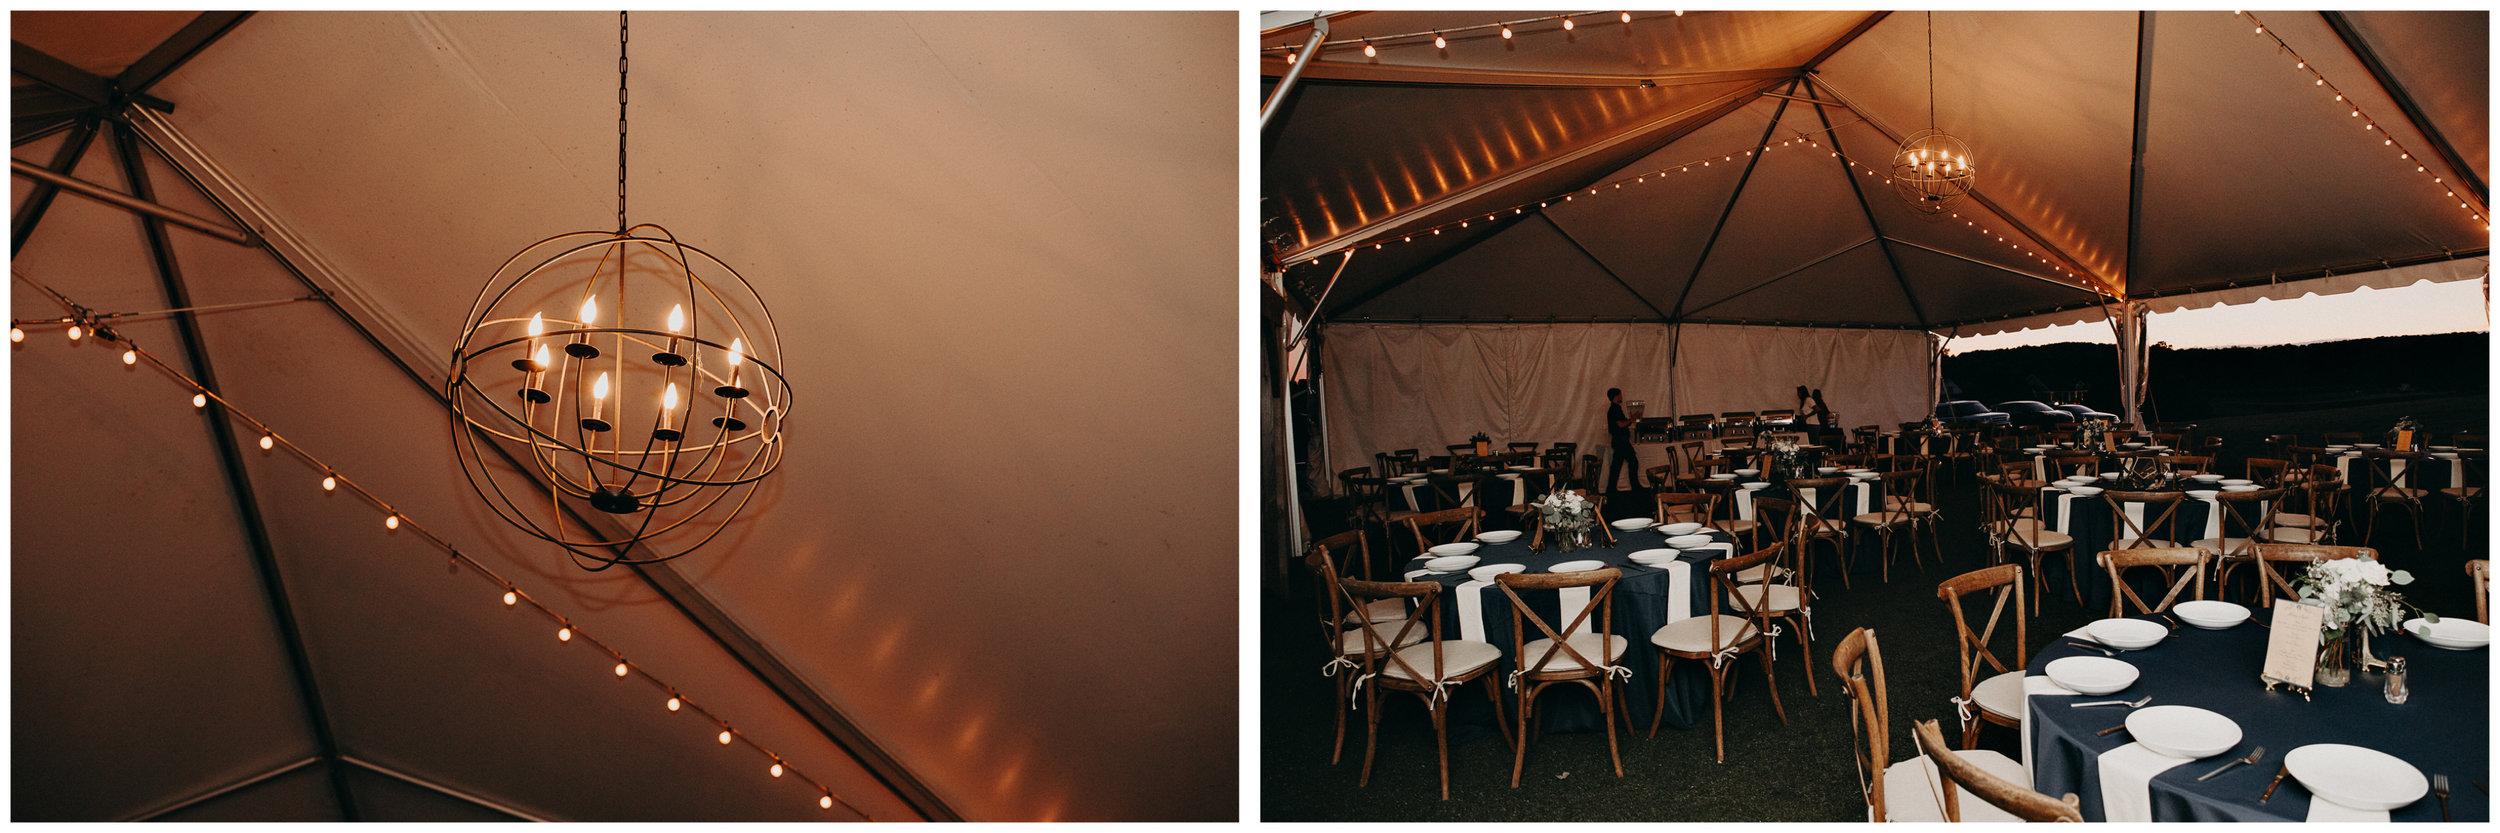 86- Kaya_vineyard_dahlonega_wedding_venue_detais_sunset_aline_marin_photography.jpg